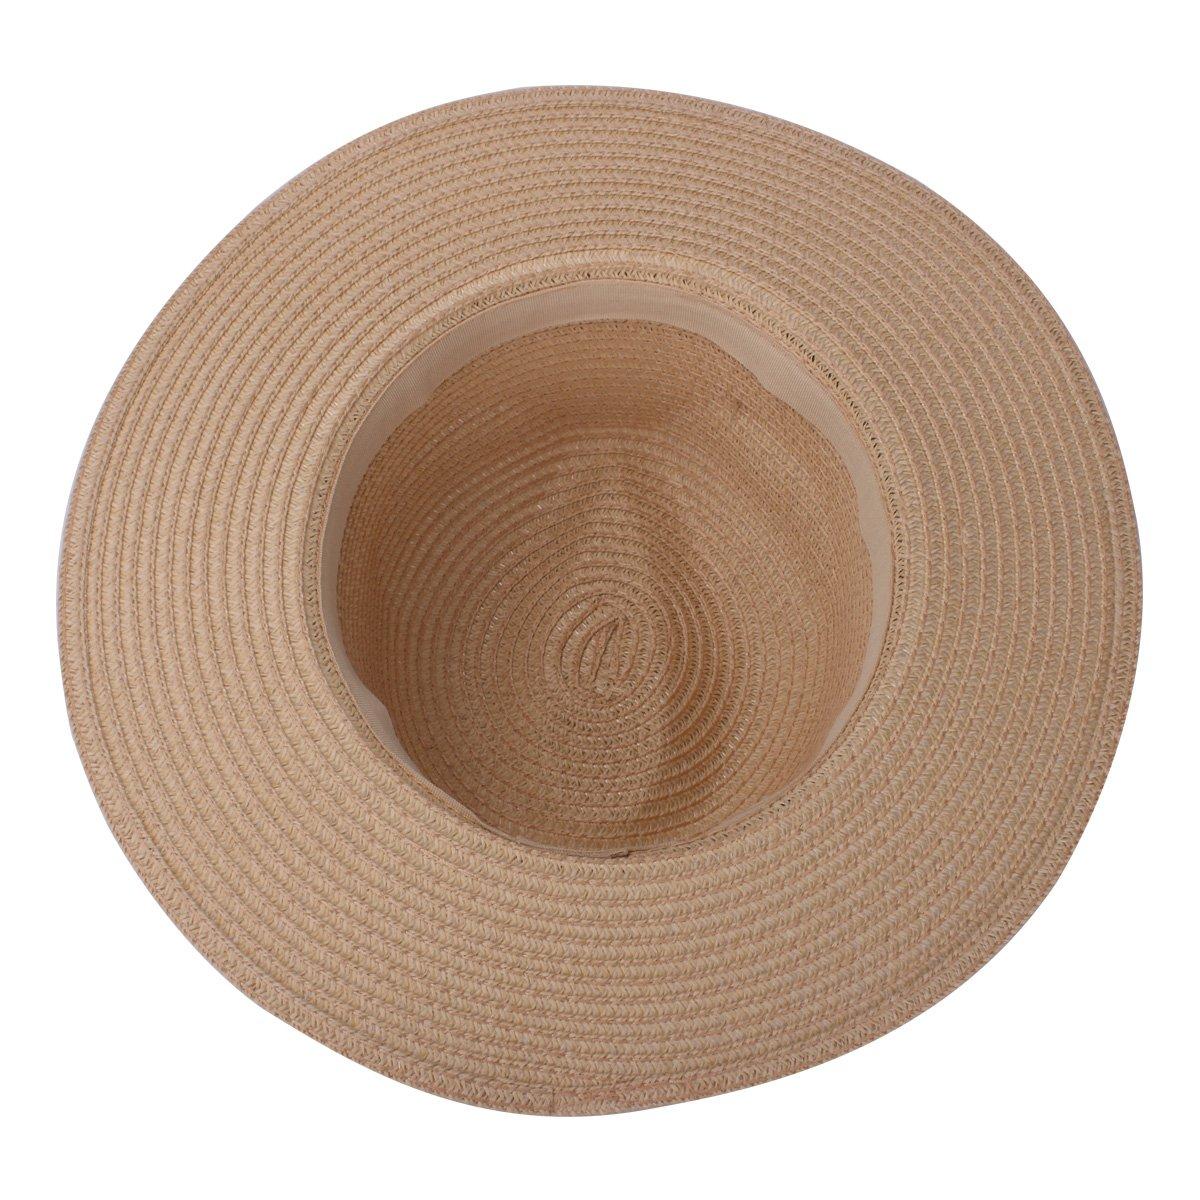 Floppy paja Sombrero de sol 623d158ac05